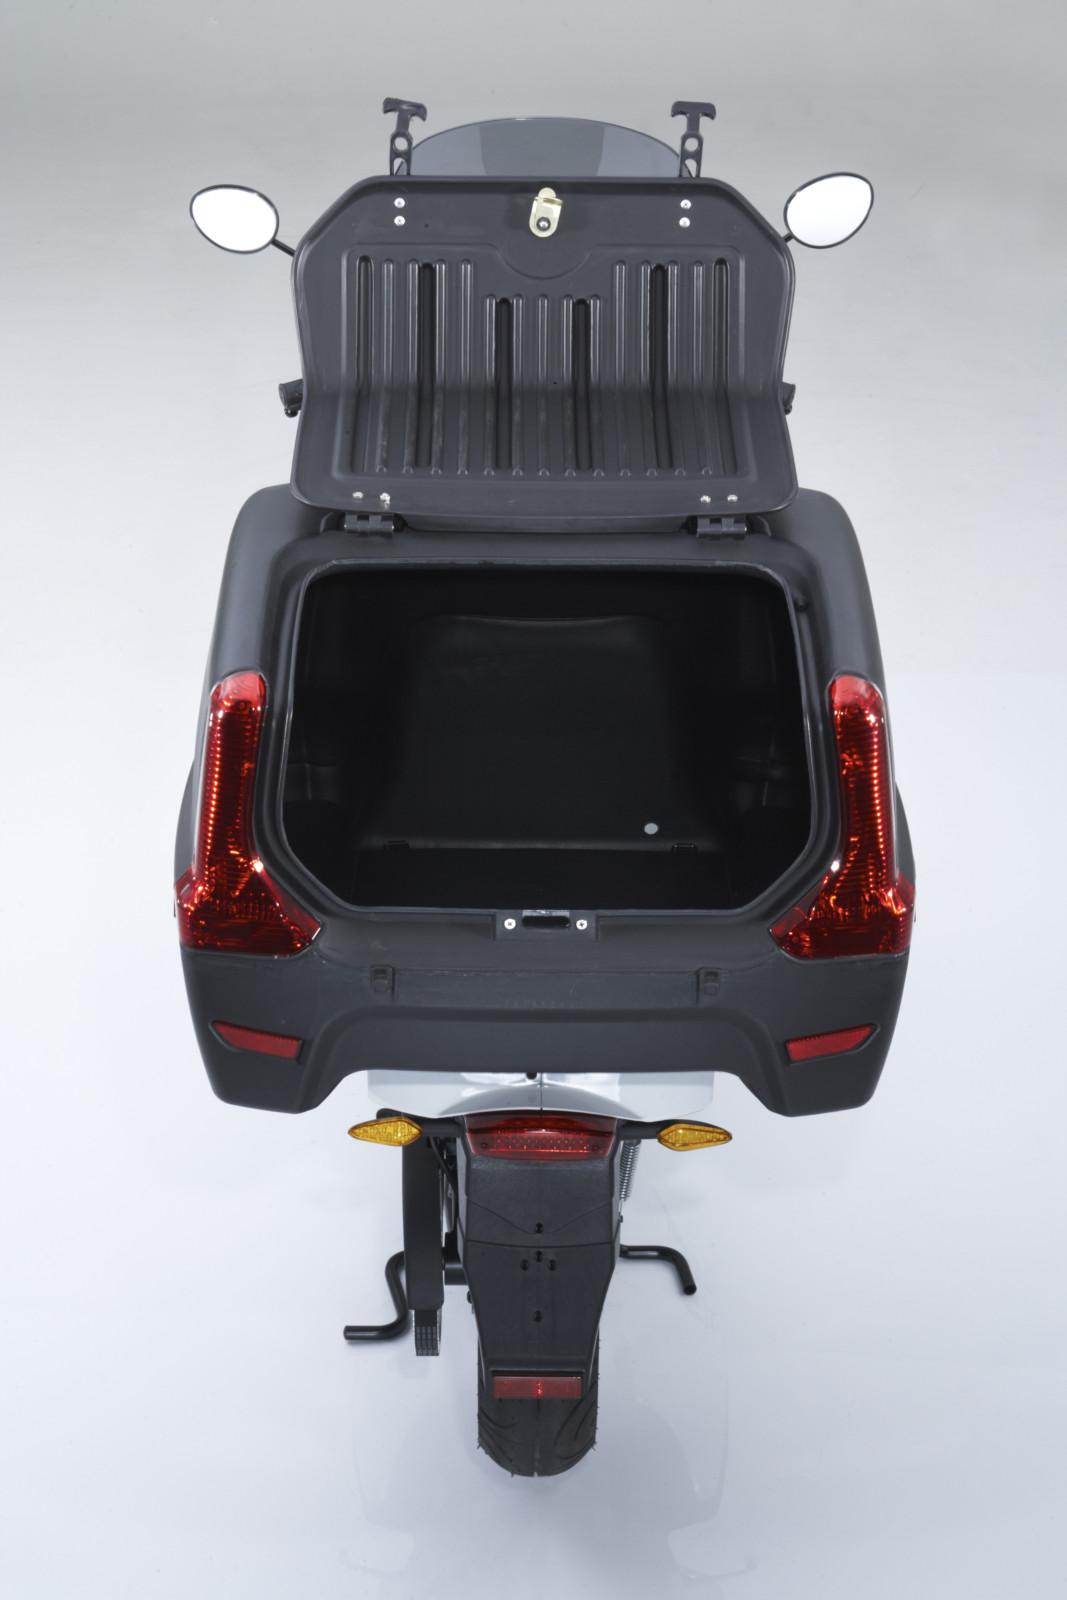 Govecs Go T1 2 🛵 Elektrische Scooters 2019